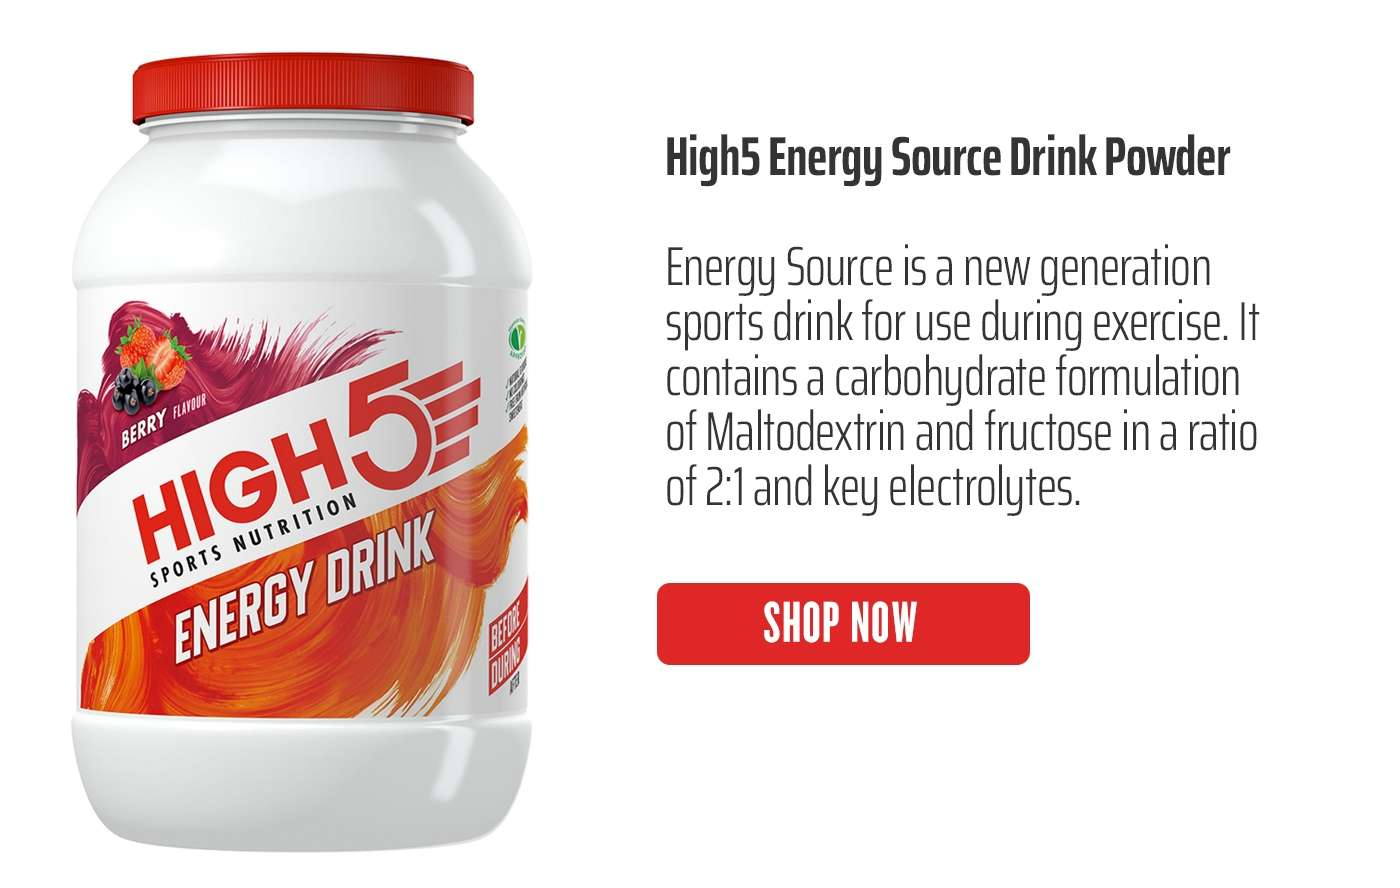 High5 Energy Source Drink Powder